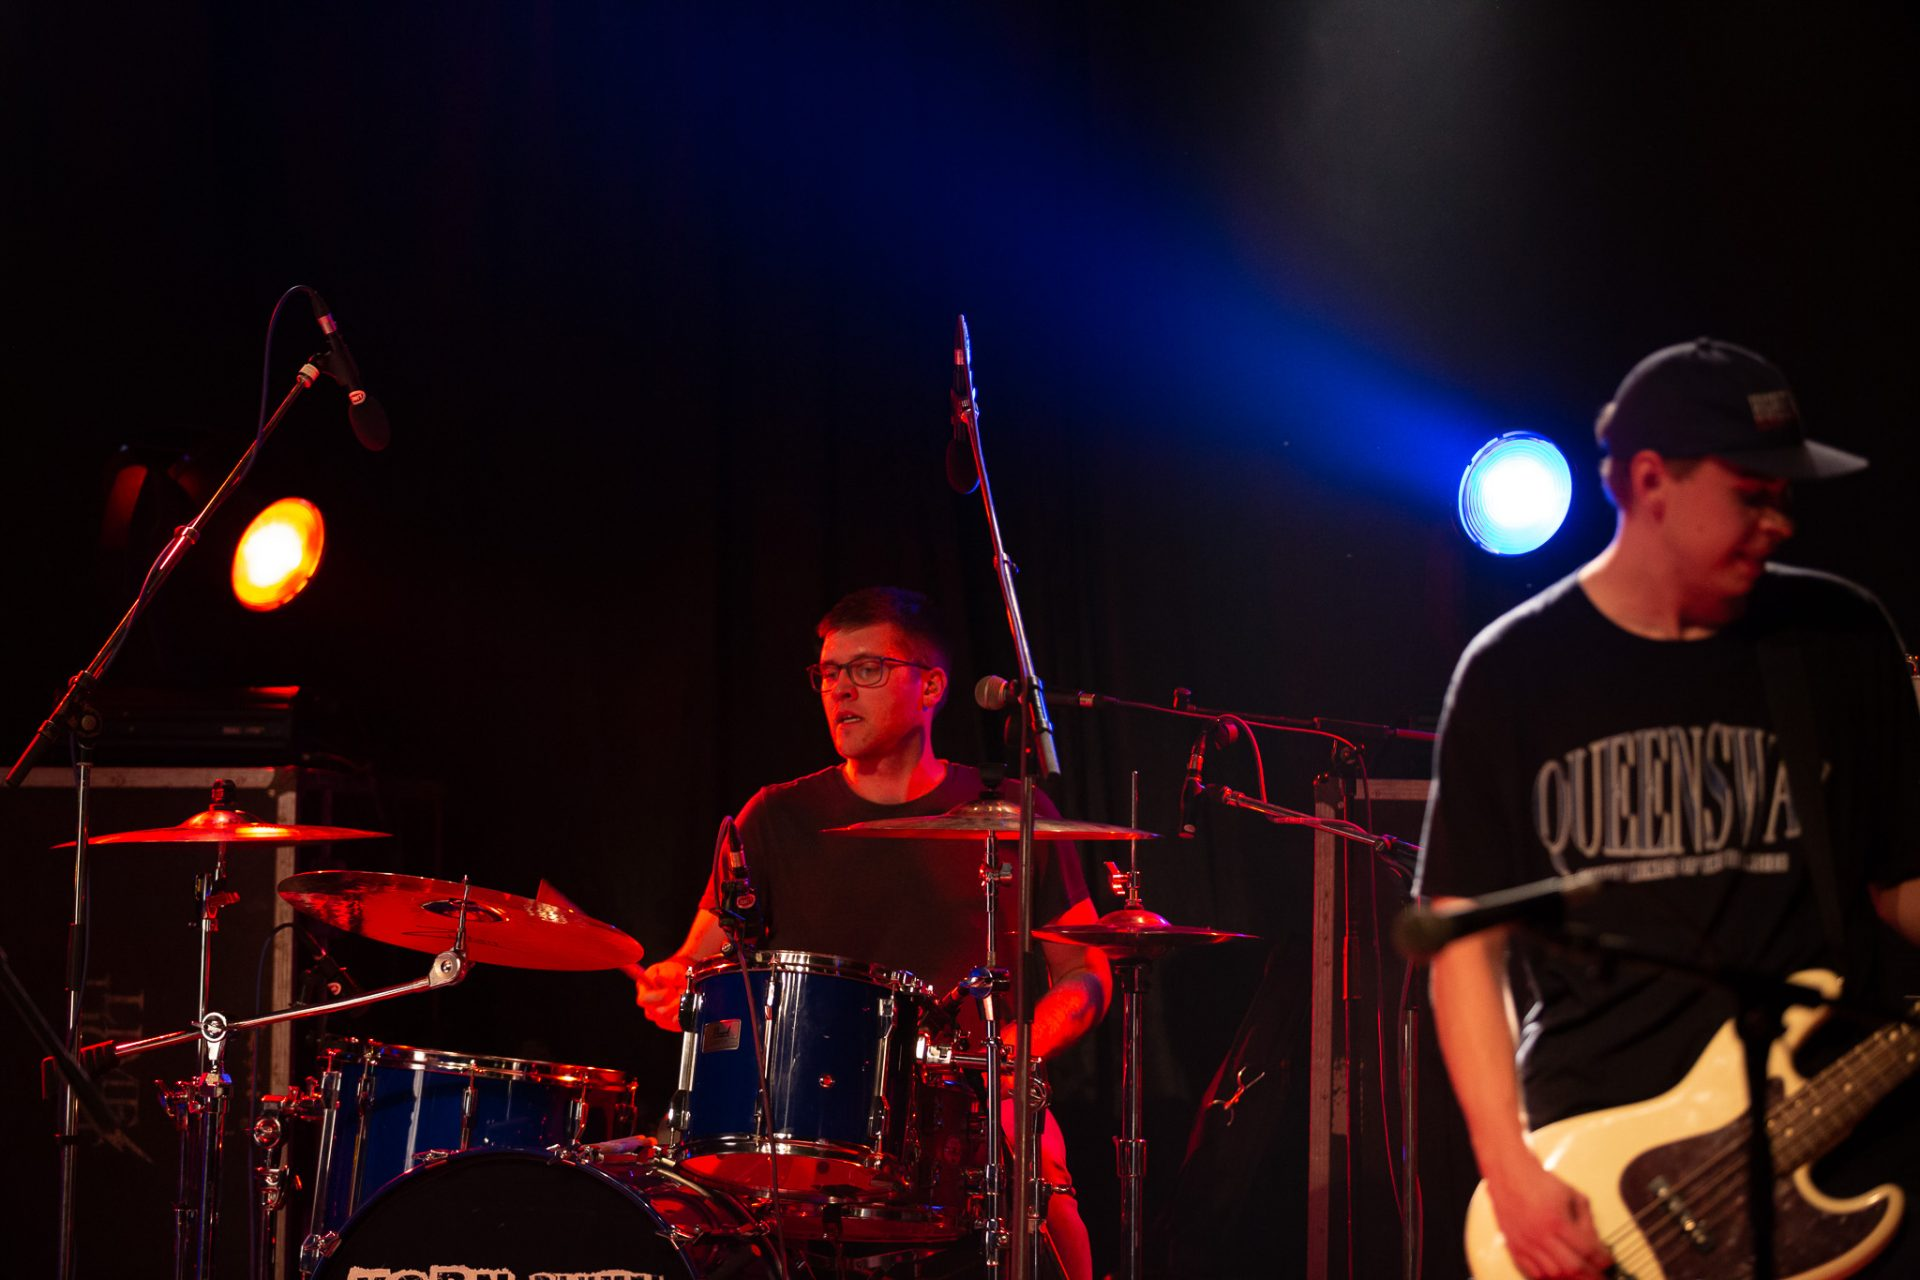 Frachter - Drummer